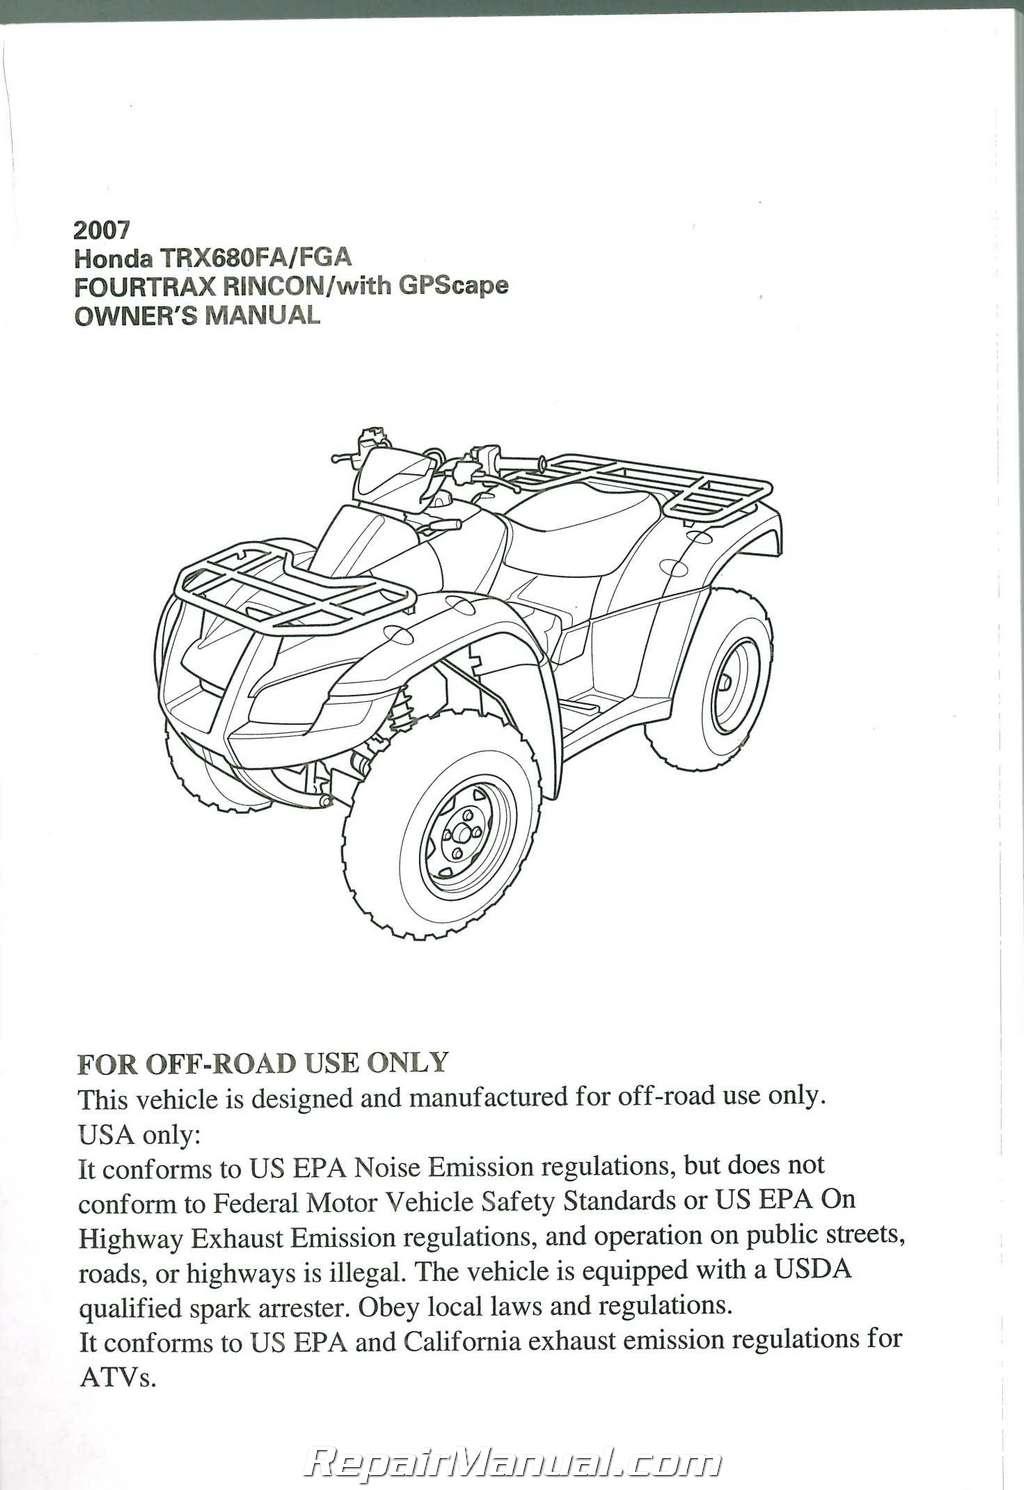 2007 Honda Trx680fa Fga Fourtrax Rincon Atv Owners Manual